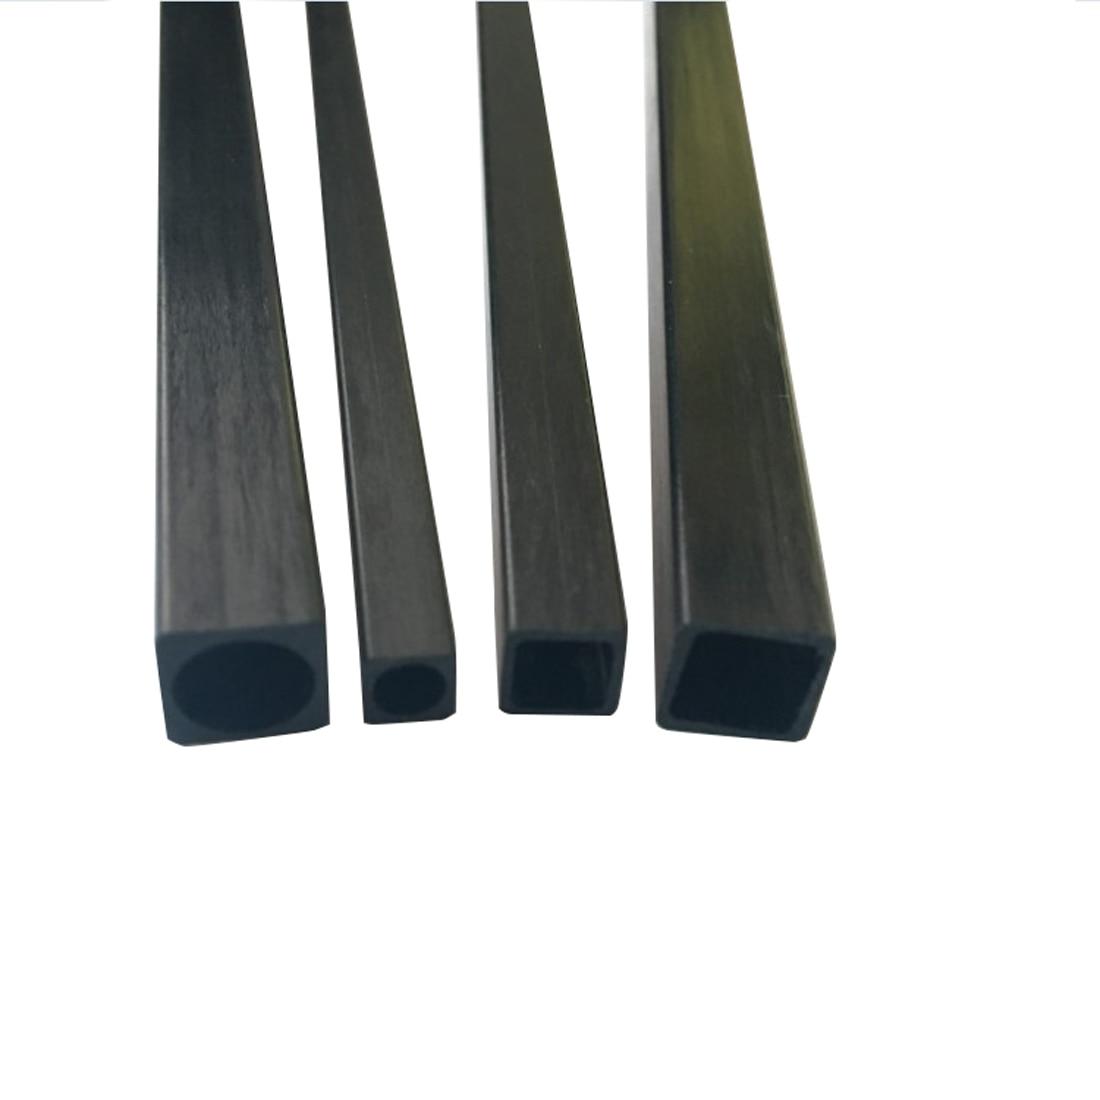 "ID 13mm 2 Pcs 6061 T6 Aluminum Seamless Tubing Tube OD 15mm 20/"" Length 0.5m"